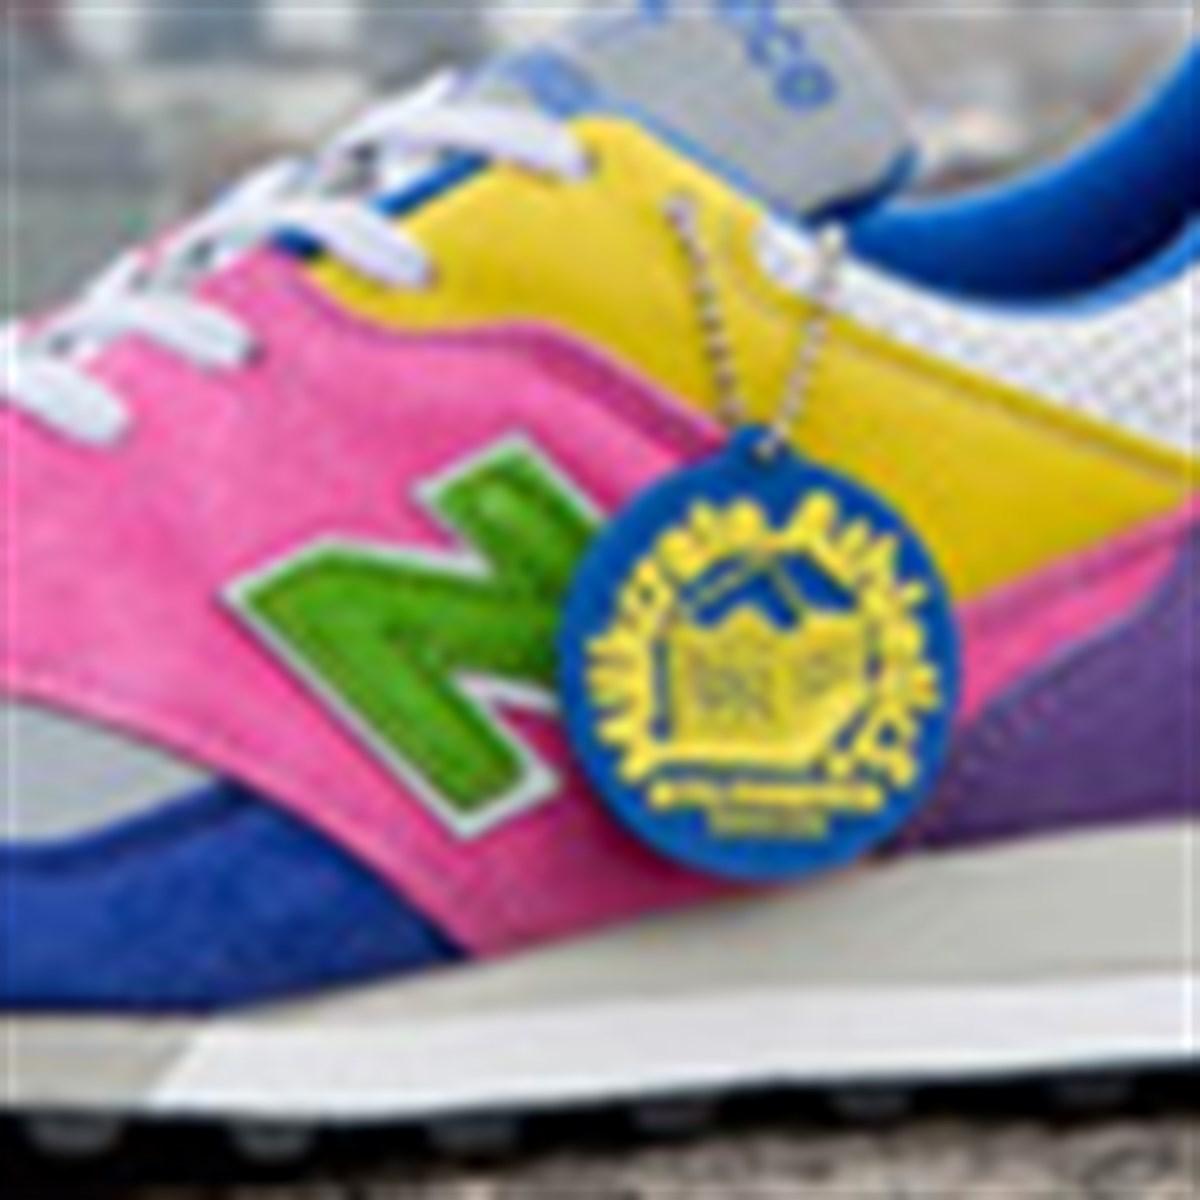 80c807f4aef216 Sneakersnstuff x Milkcrate Athletics x New Balance - Sneakersnstuff ...